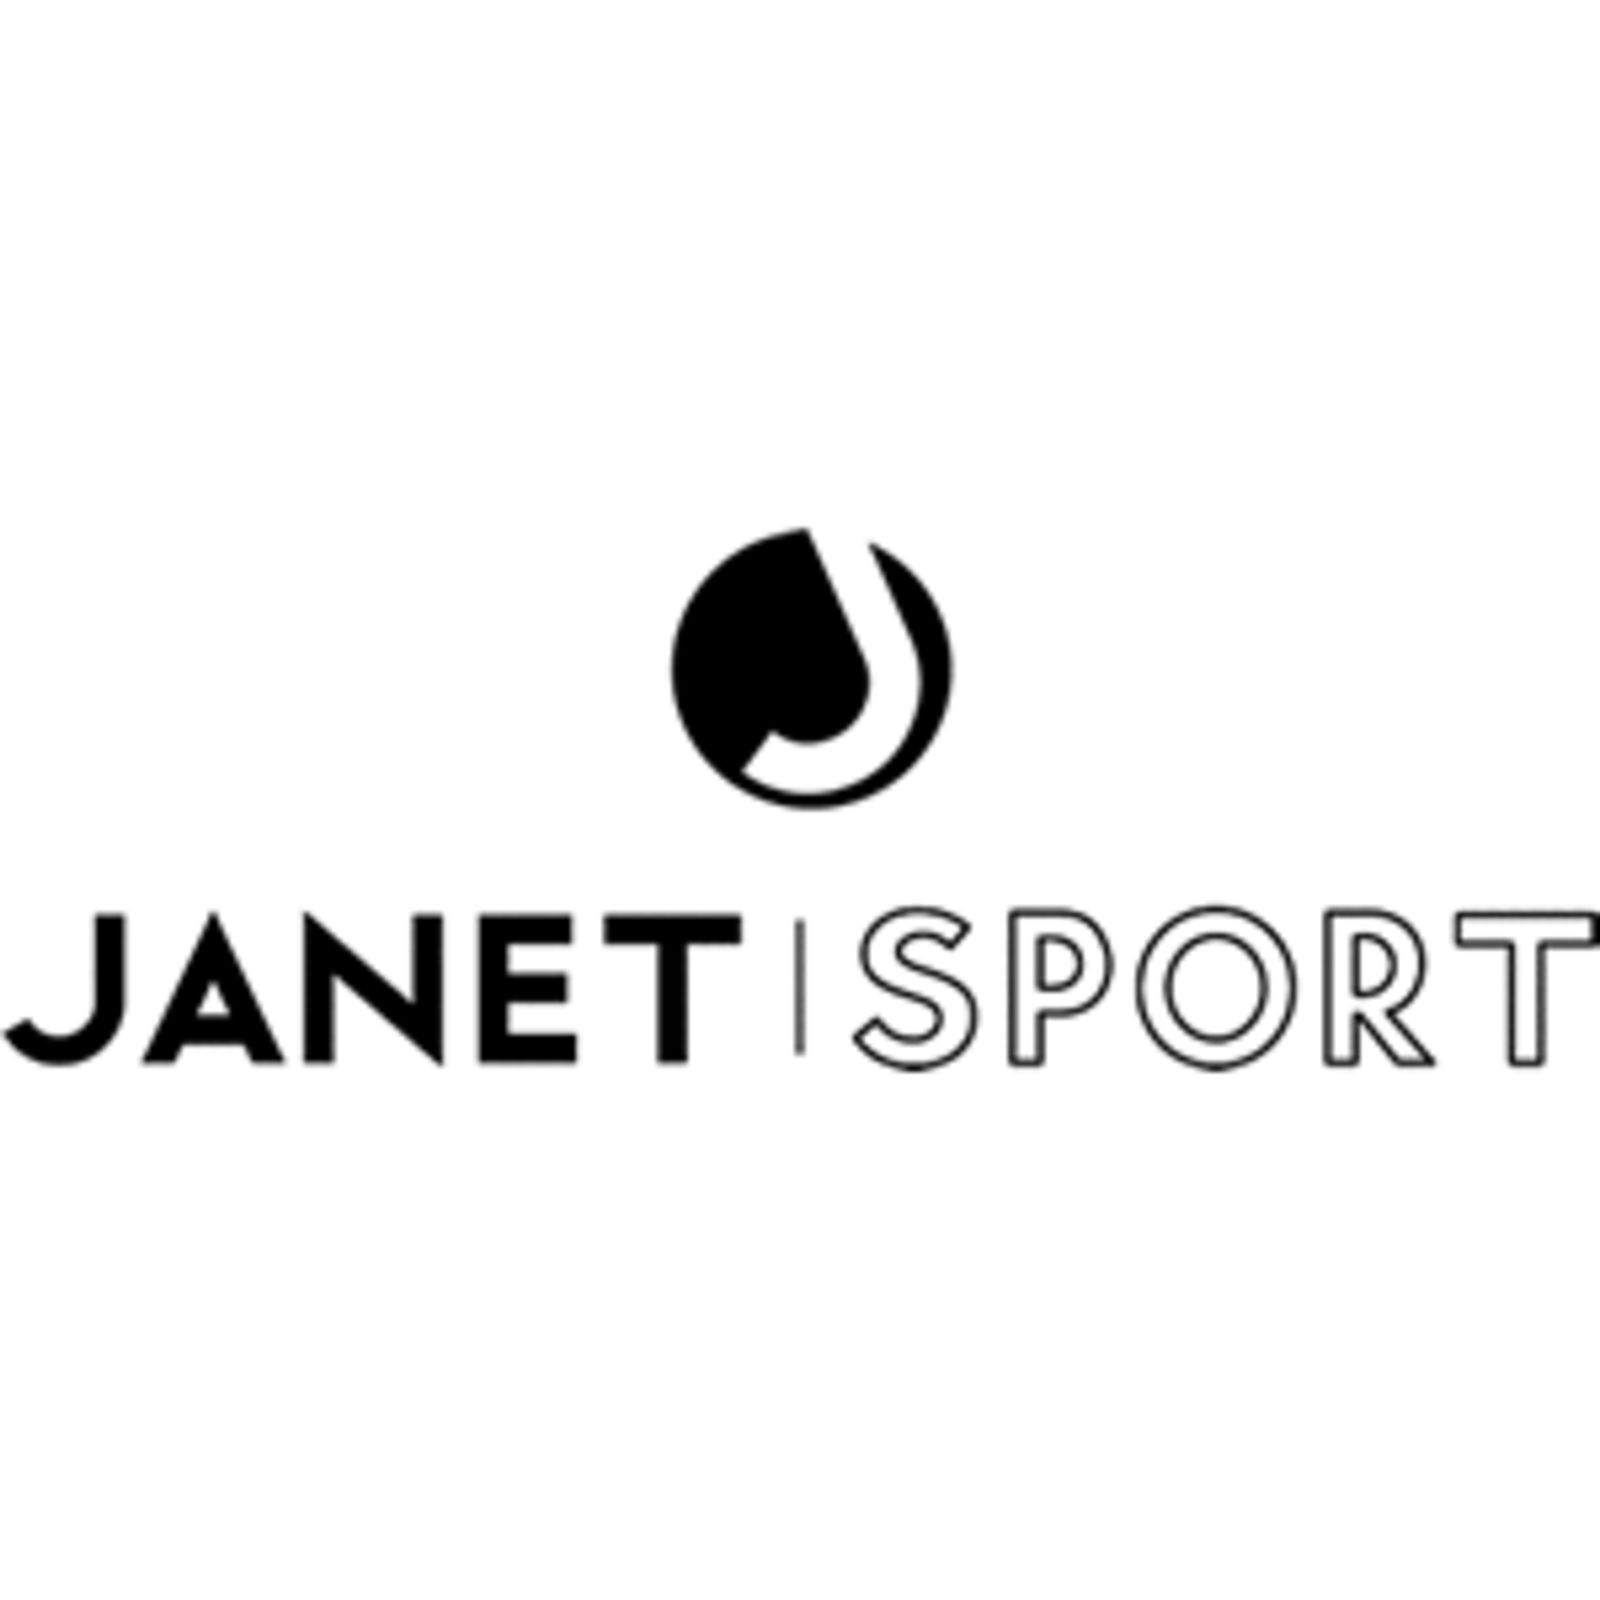 JANET SPORT